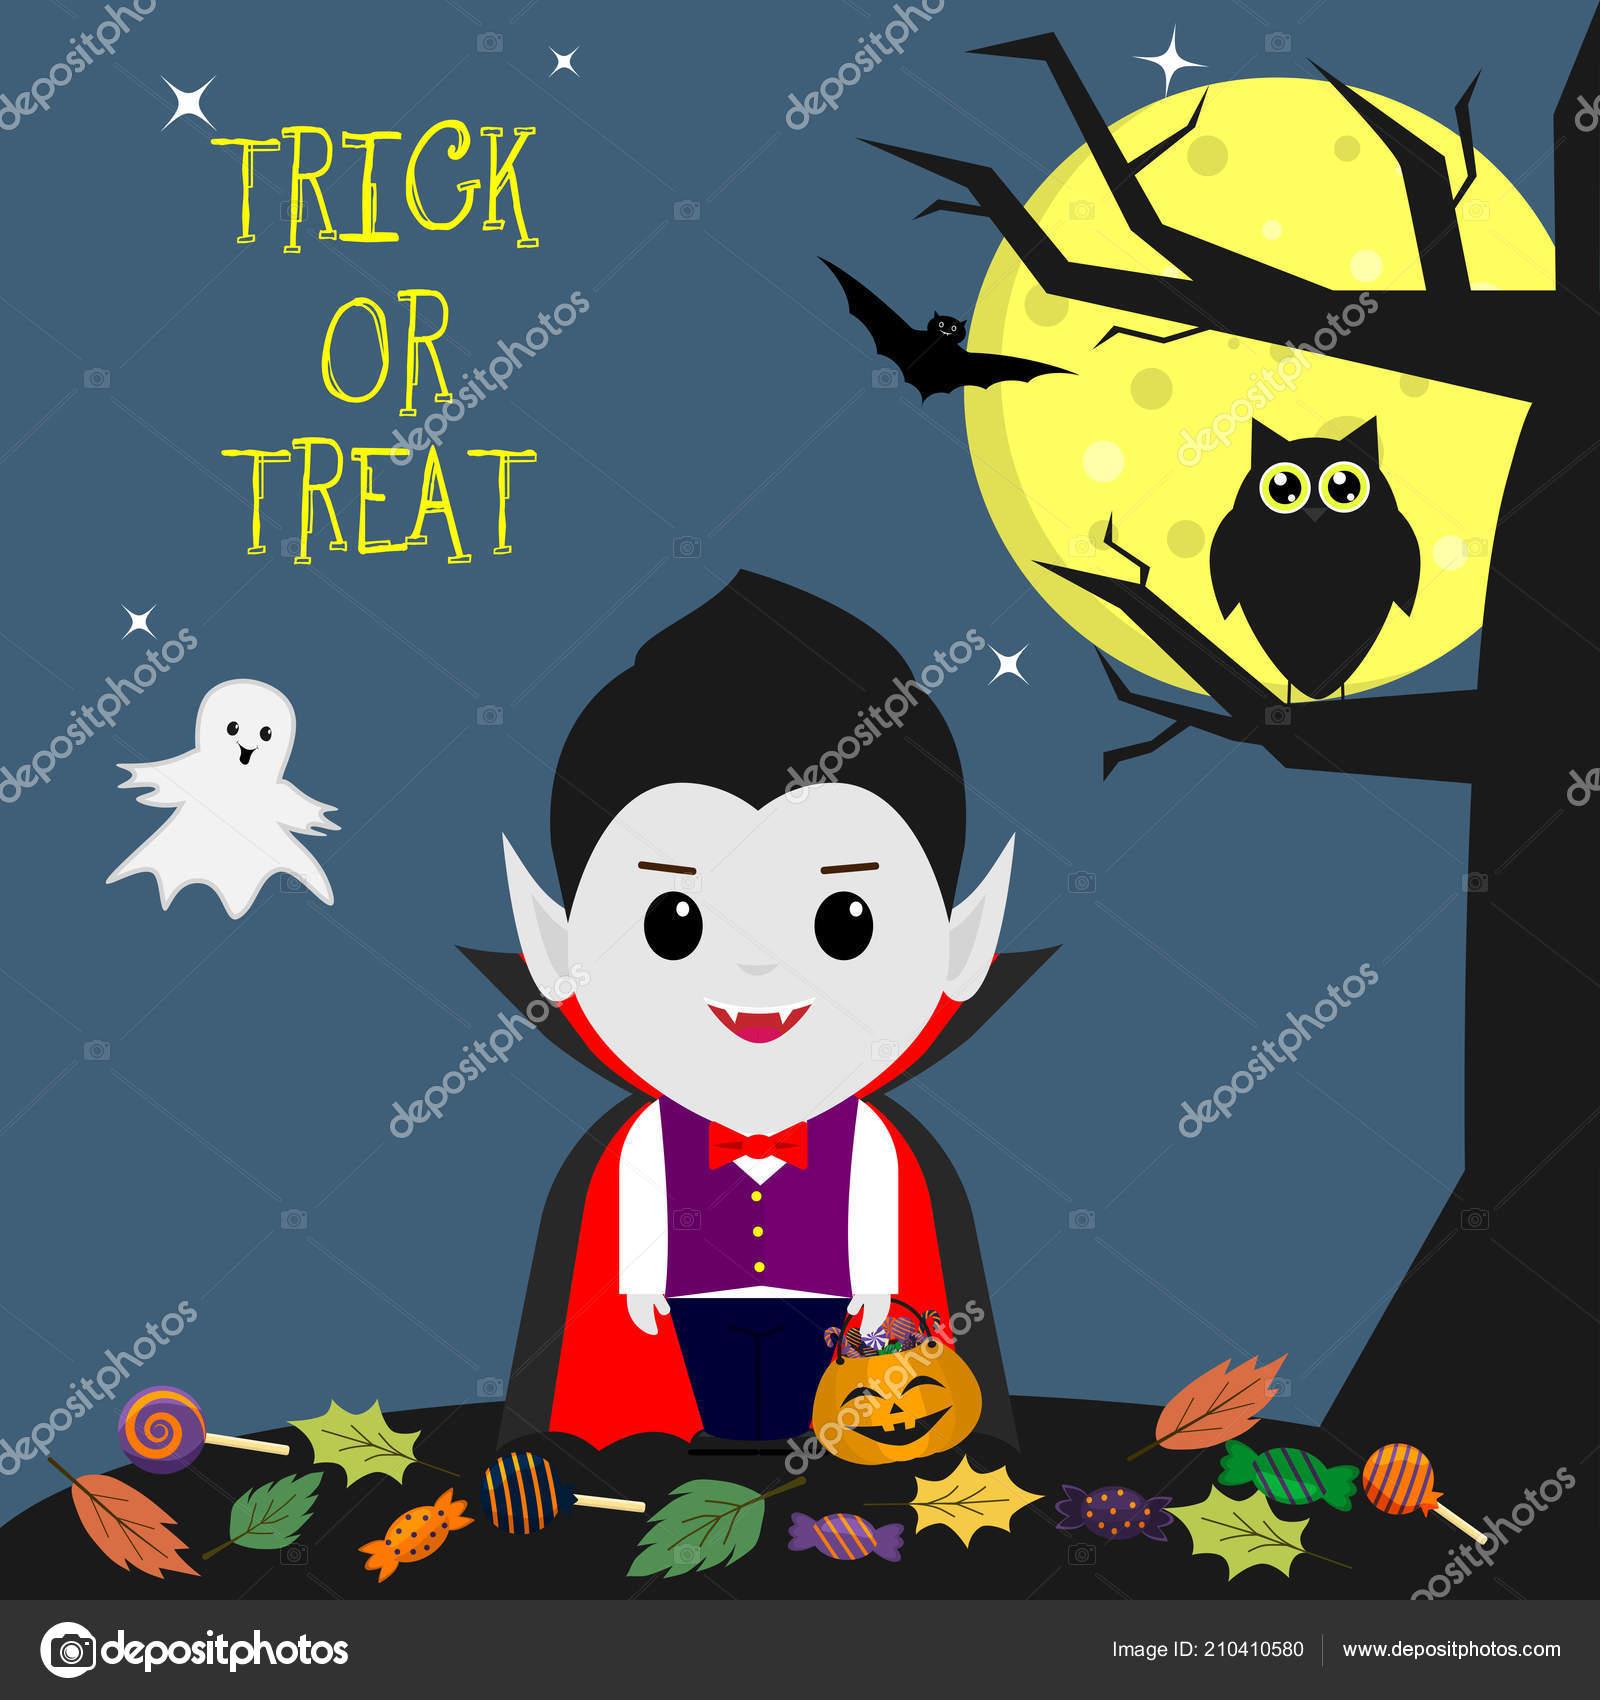 Felice halloween vampiro nello stile cartone animato leva piedi